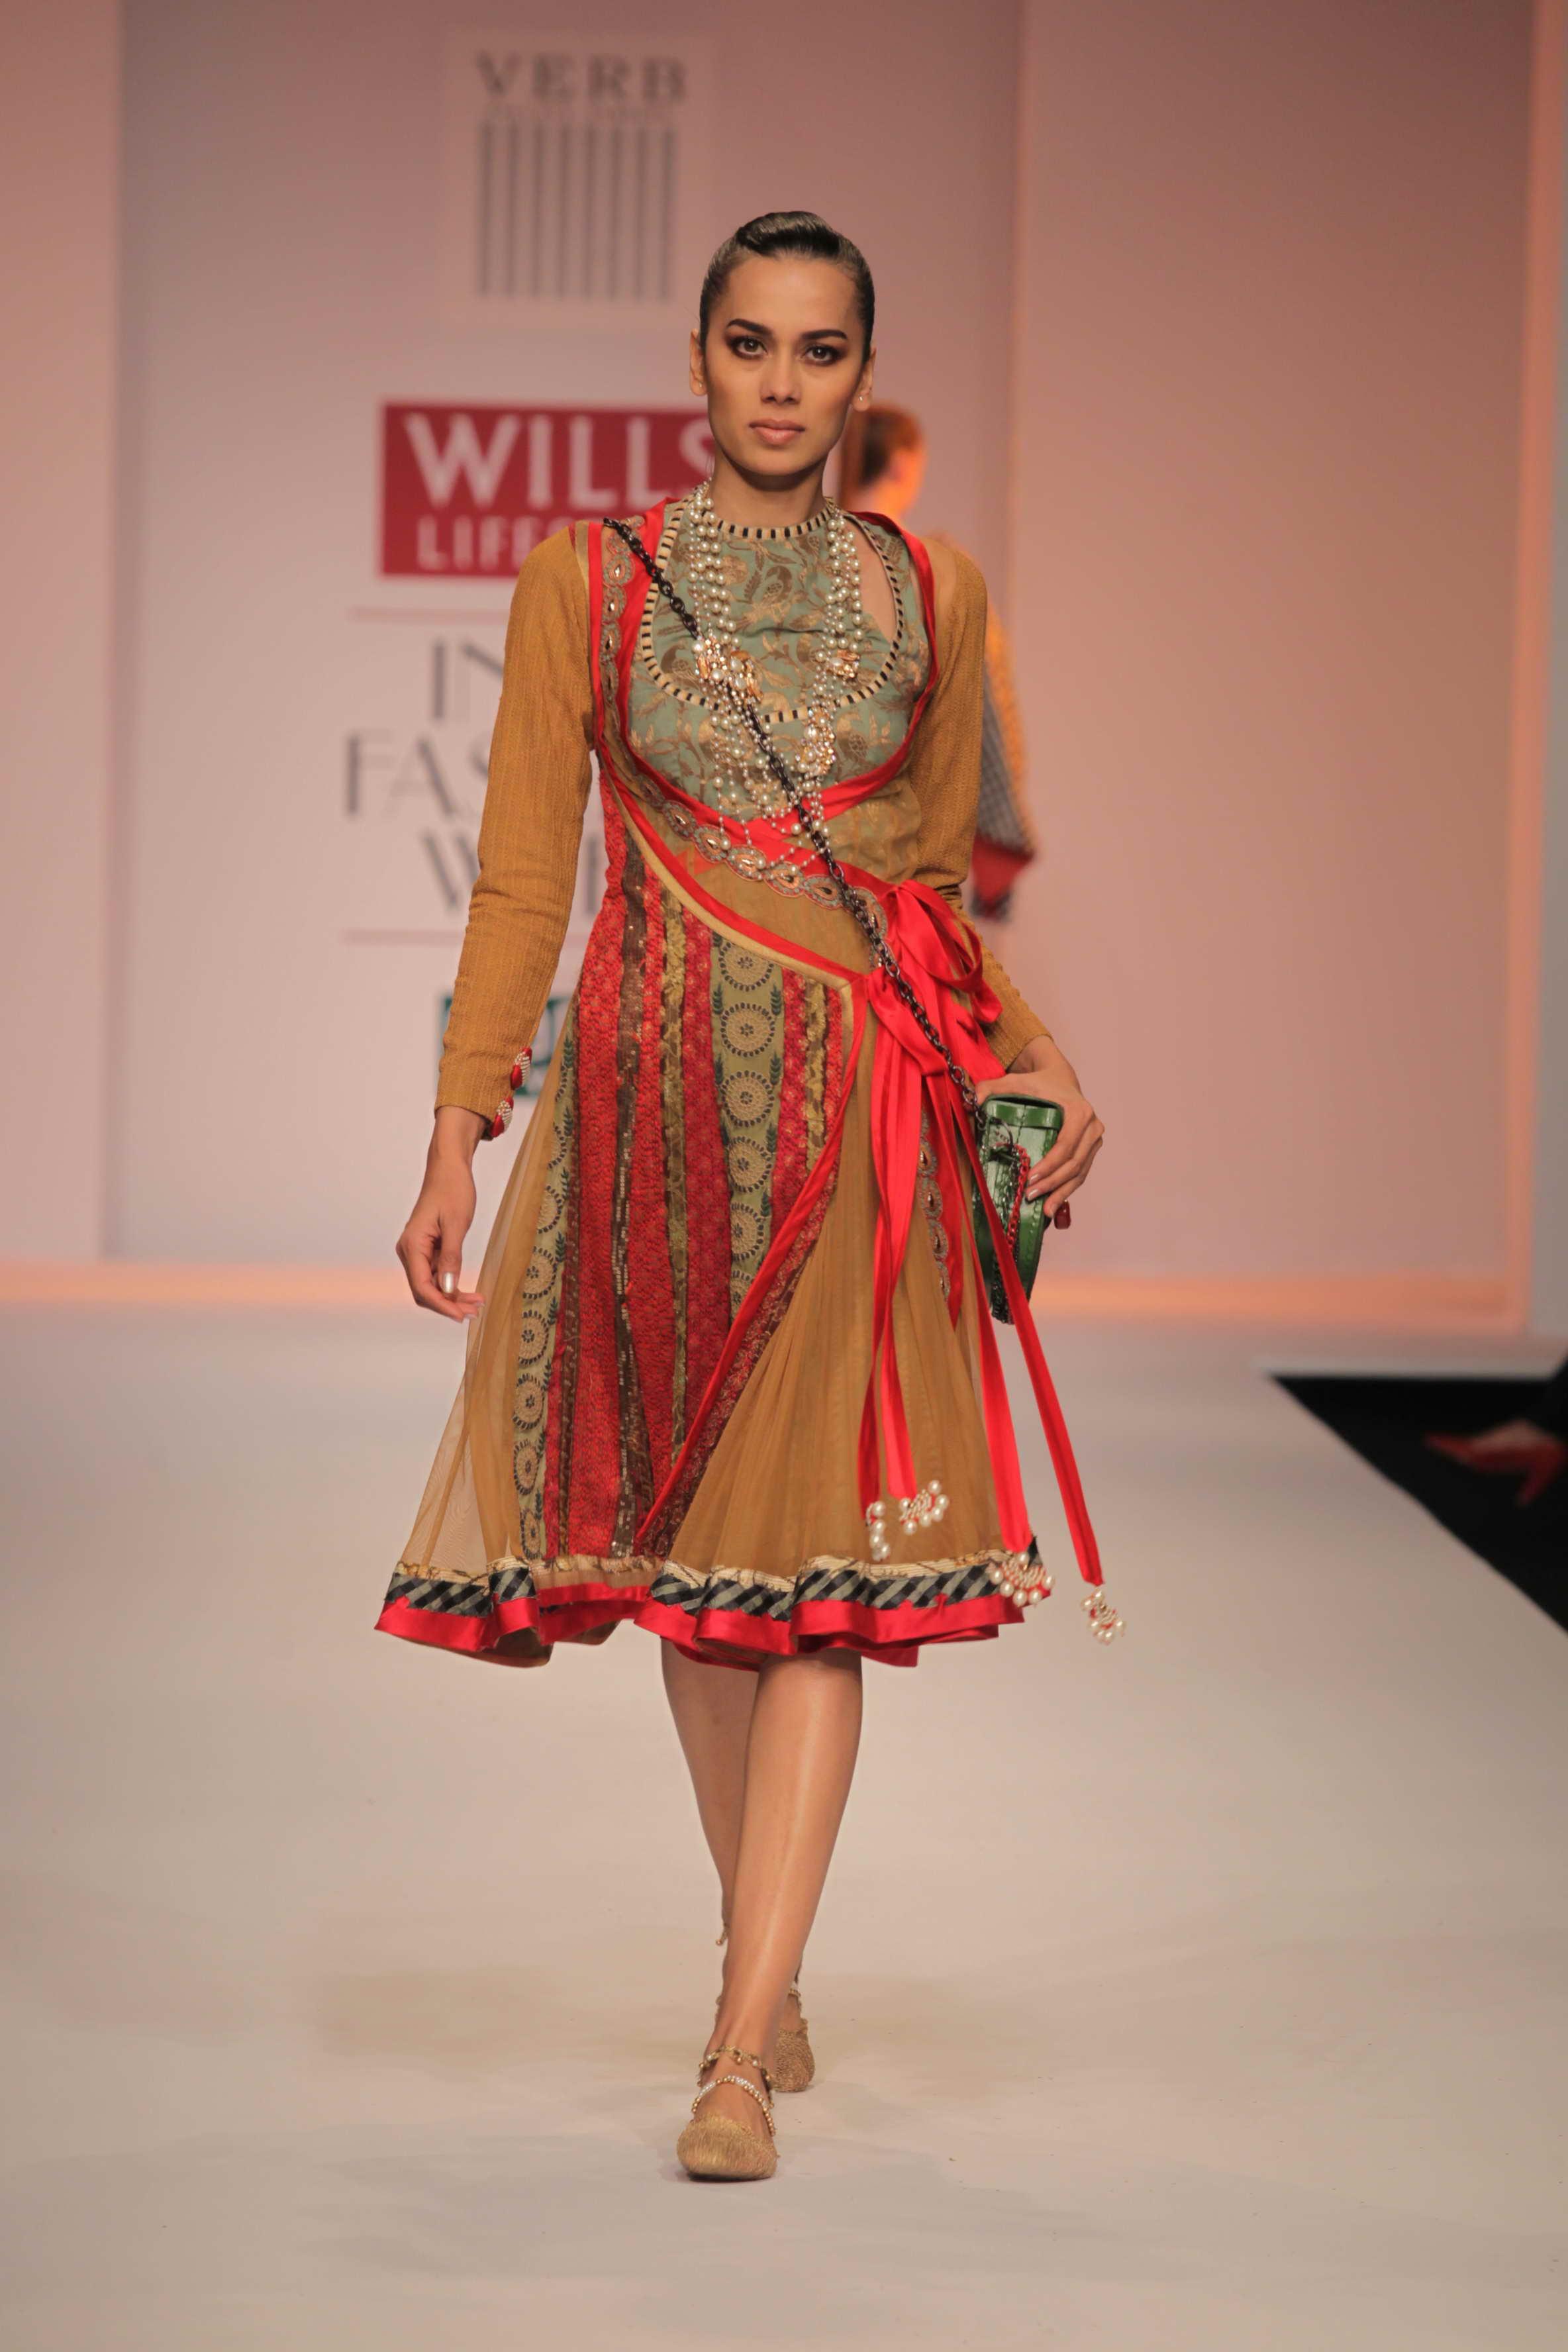 Style Trends at Wills Lifestyle India Fashion Week WLIFW ... Sabyasachi Kurtis